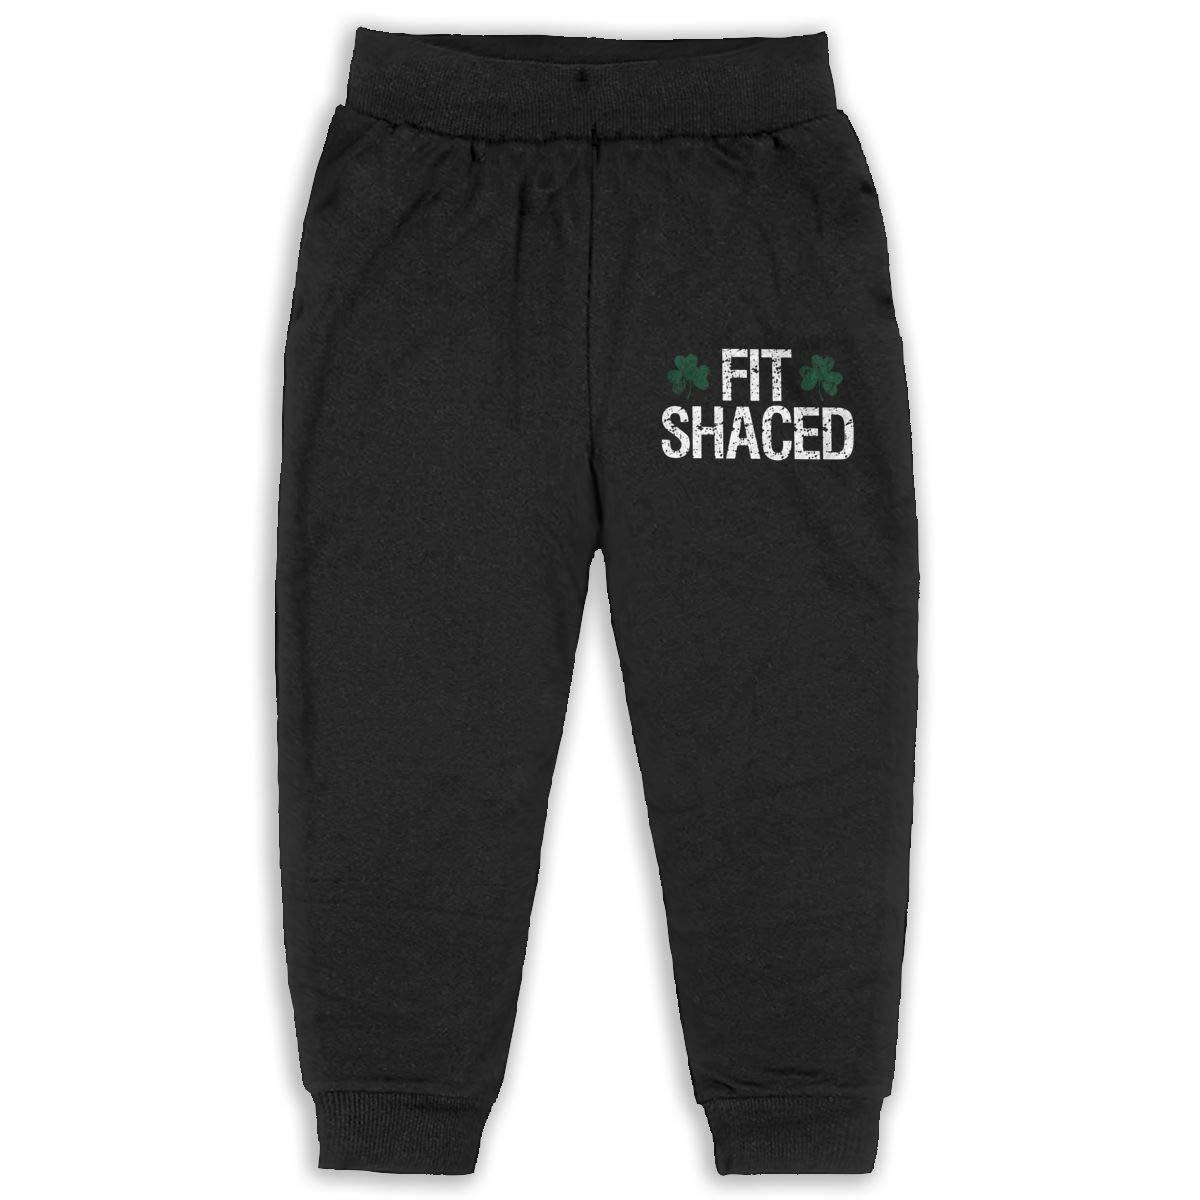 Fit Shaced Kids Cotton Sweatpants,Jogger Long Jersey Sweatpants